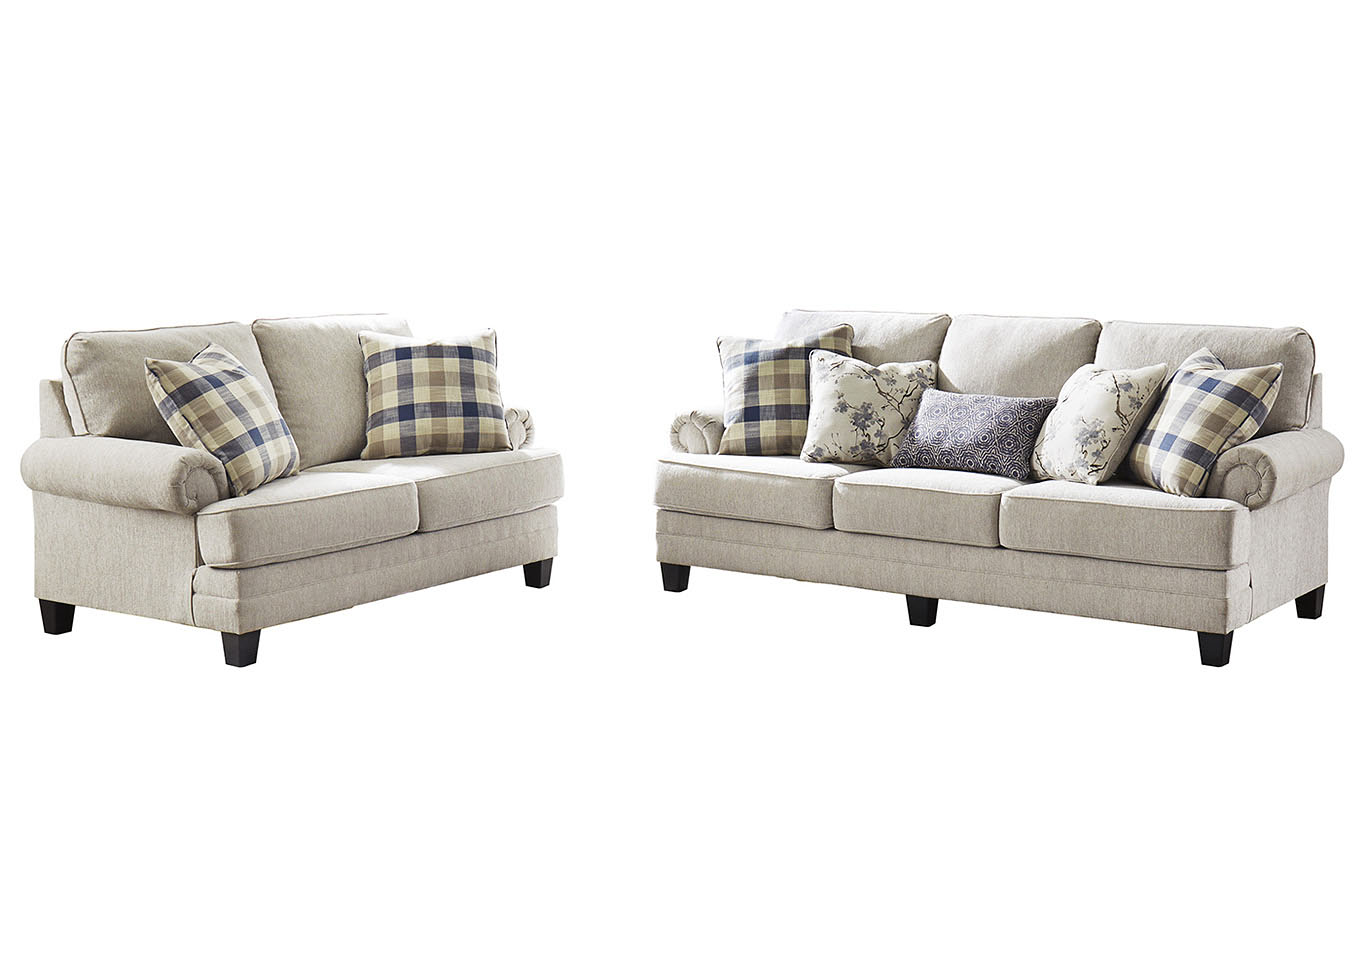 Phenomenal Ivan Smith Meggett Linen Sofa And Loveseat Alphanode Cool Chair Designs And Ideas Alphanodeonline